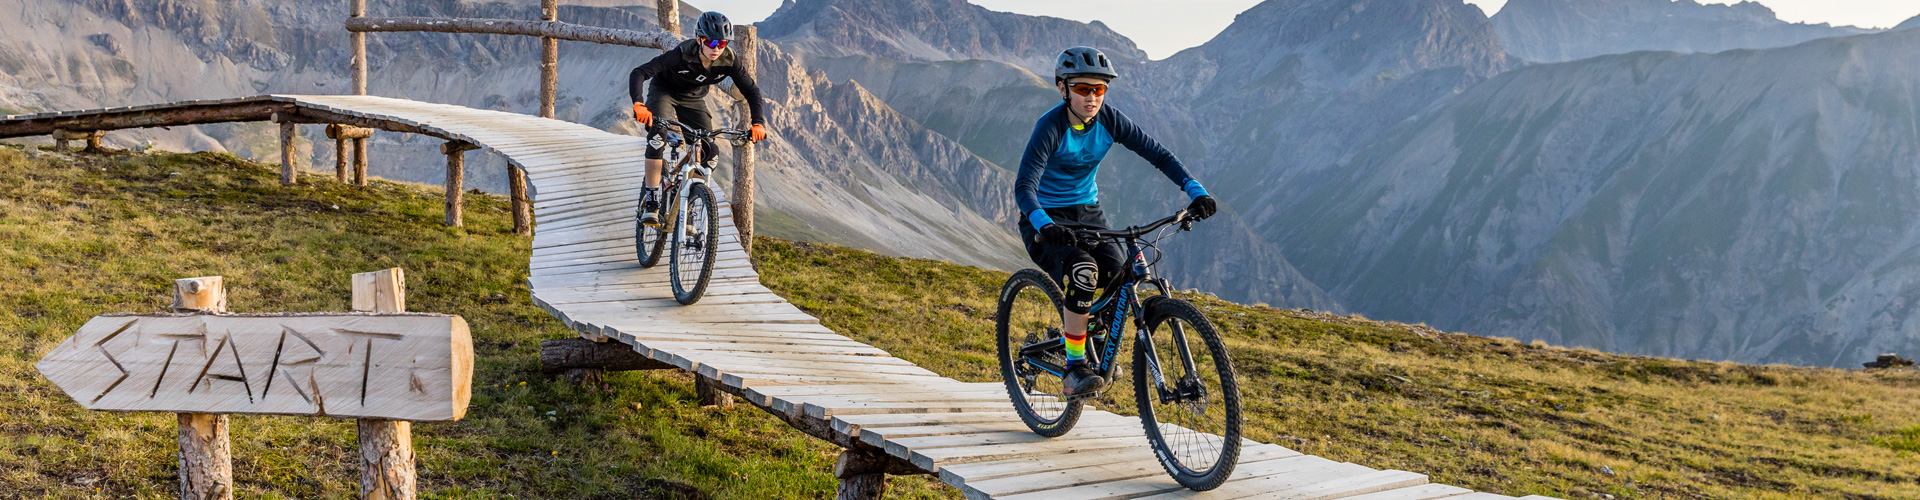 Sentieri MTB Bike Academy - Carosello 3000 Livigno